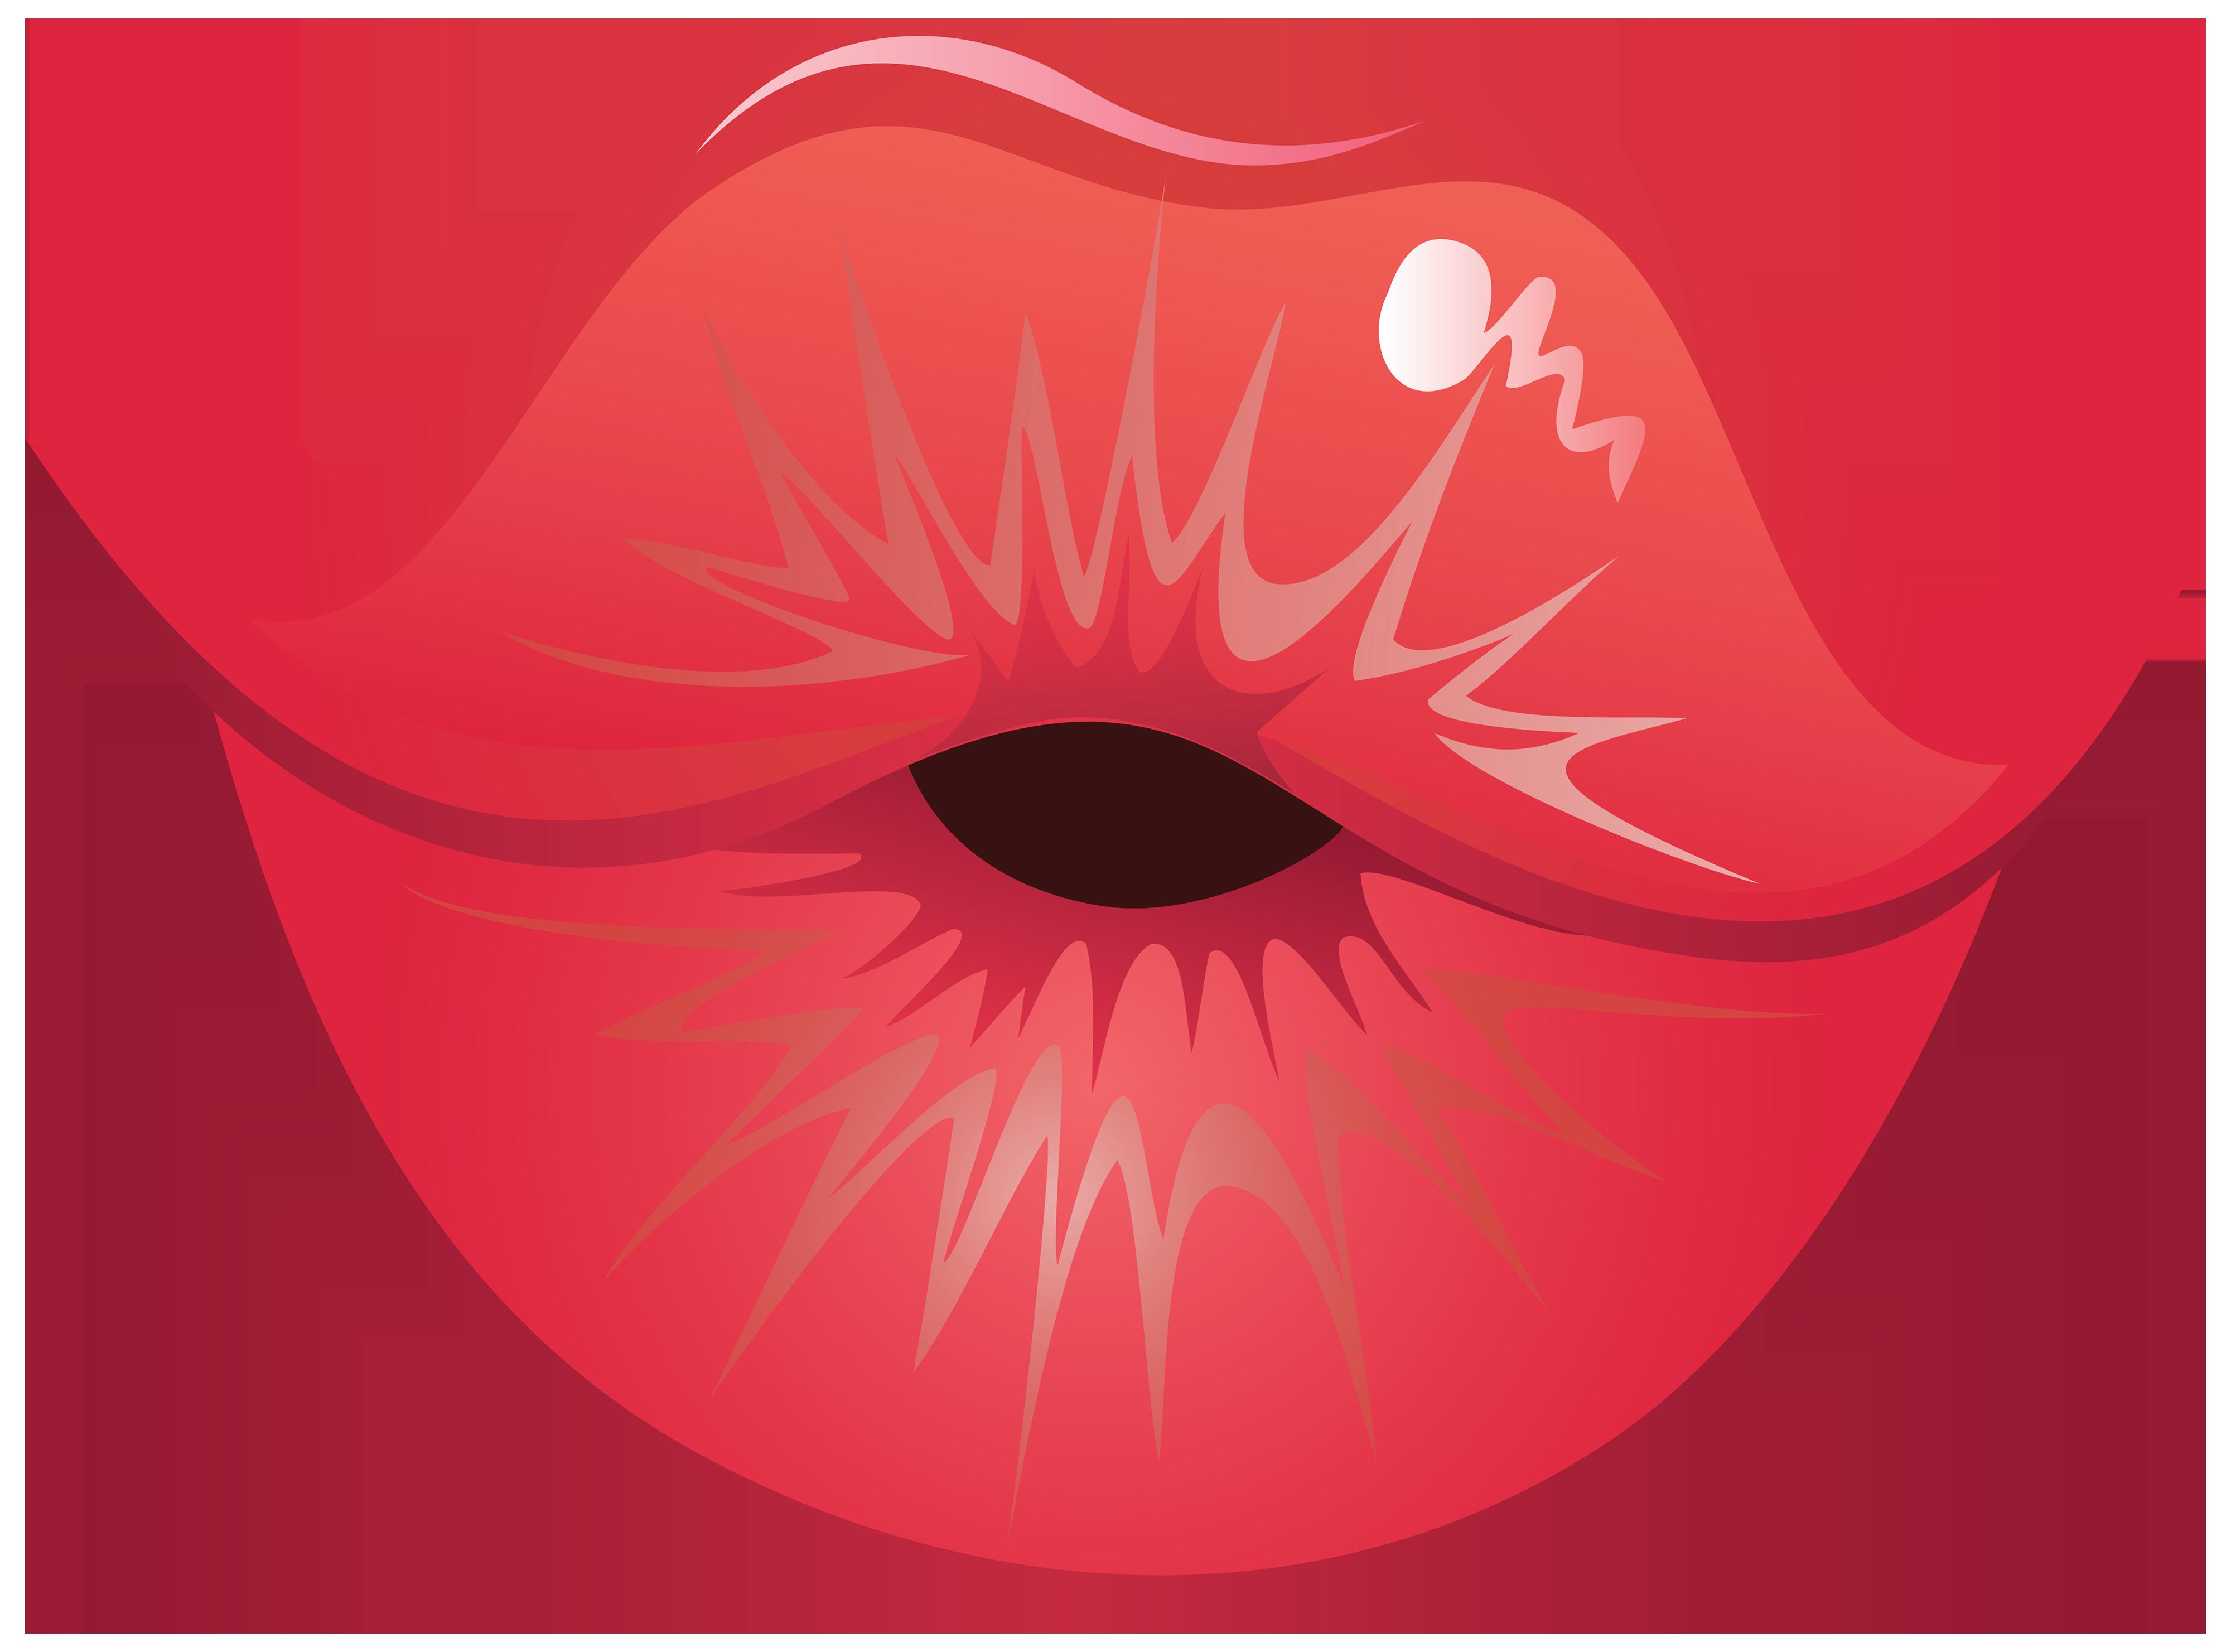 Clipart kiss lips.